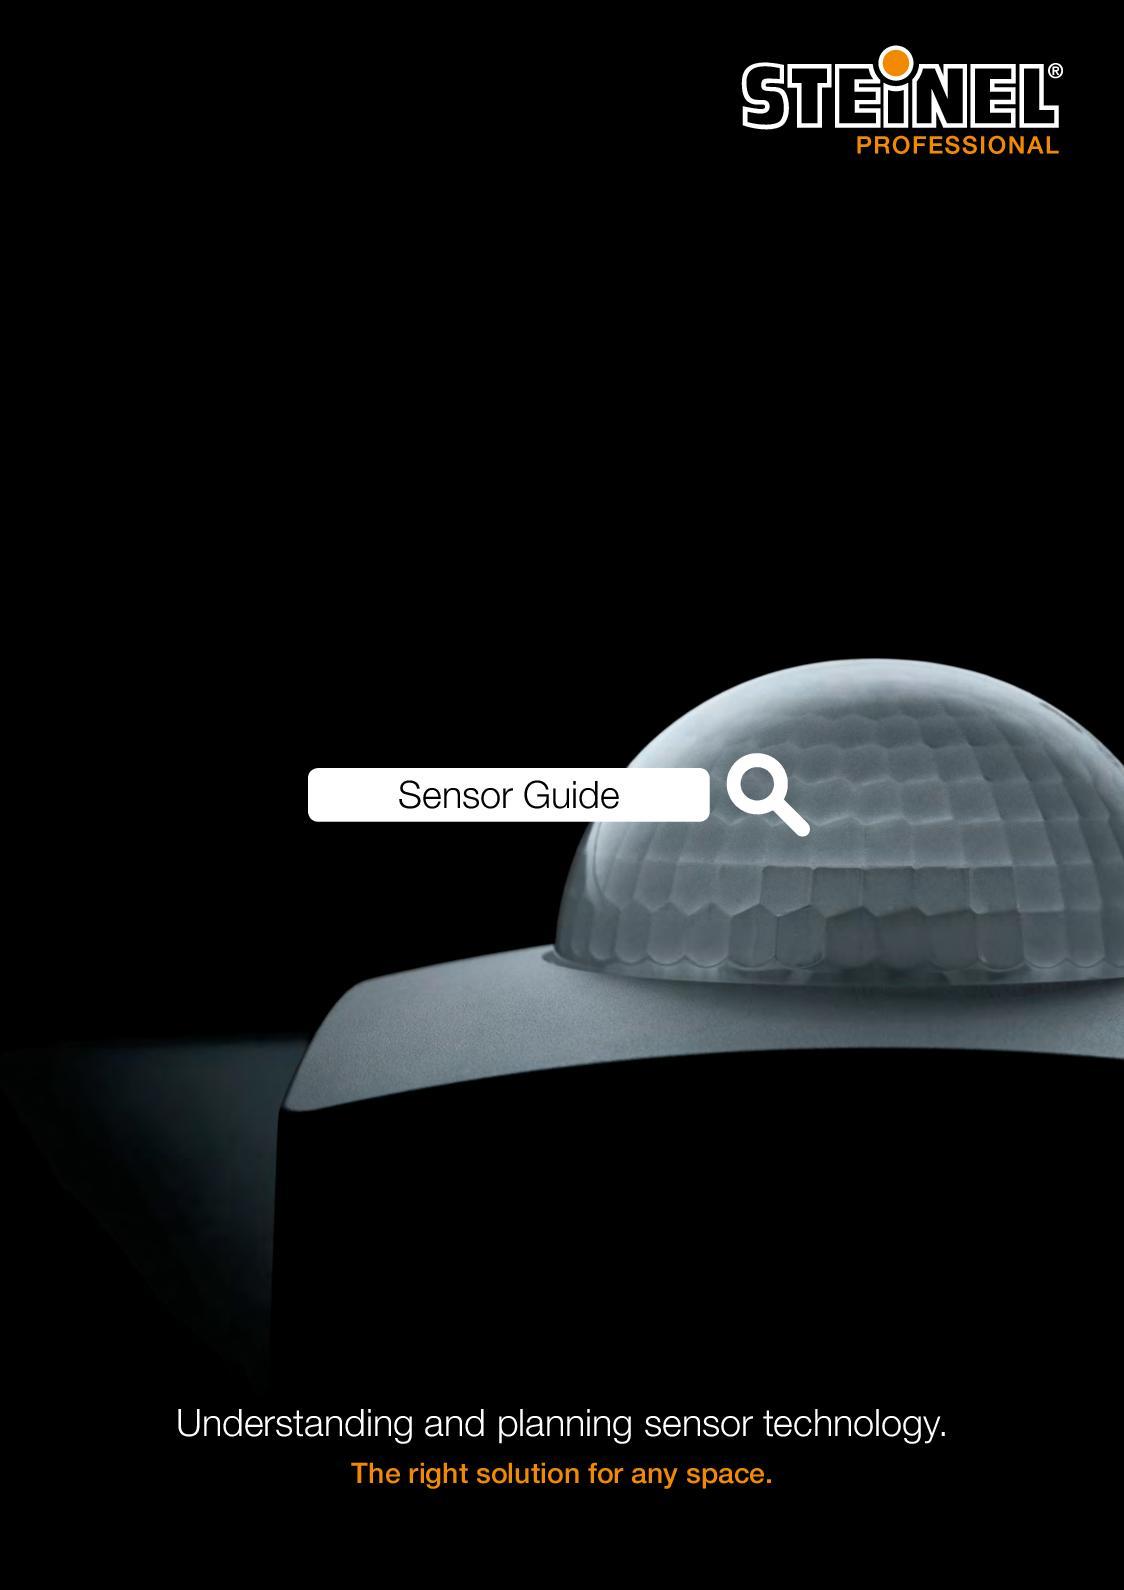 Steinel Outdoor Floodlight XLED Black Security Light Lamp 009977